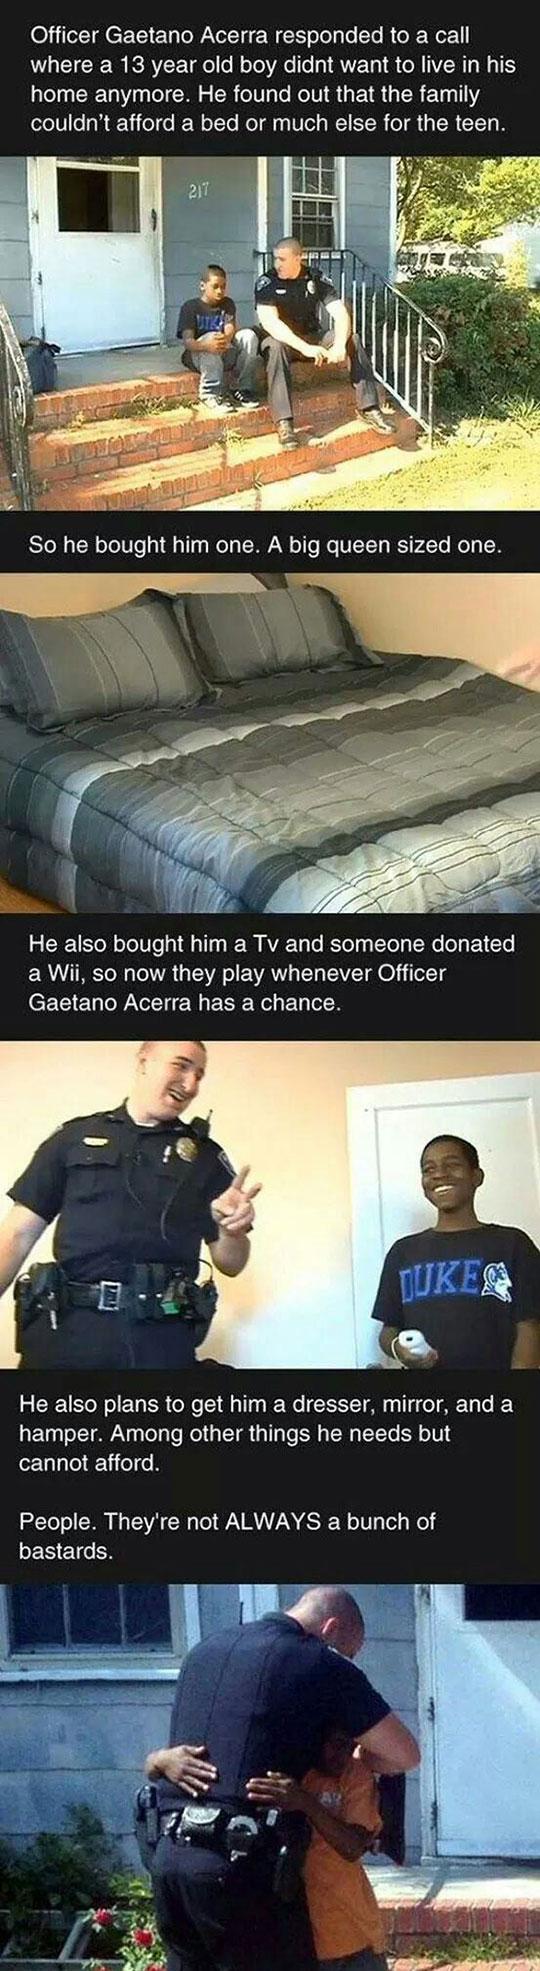 cool-police-officer-gift-mattress-kid